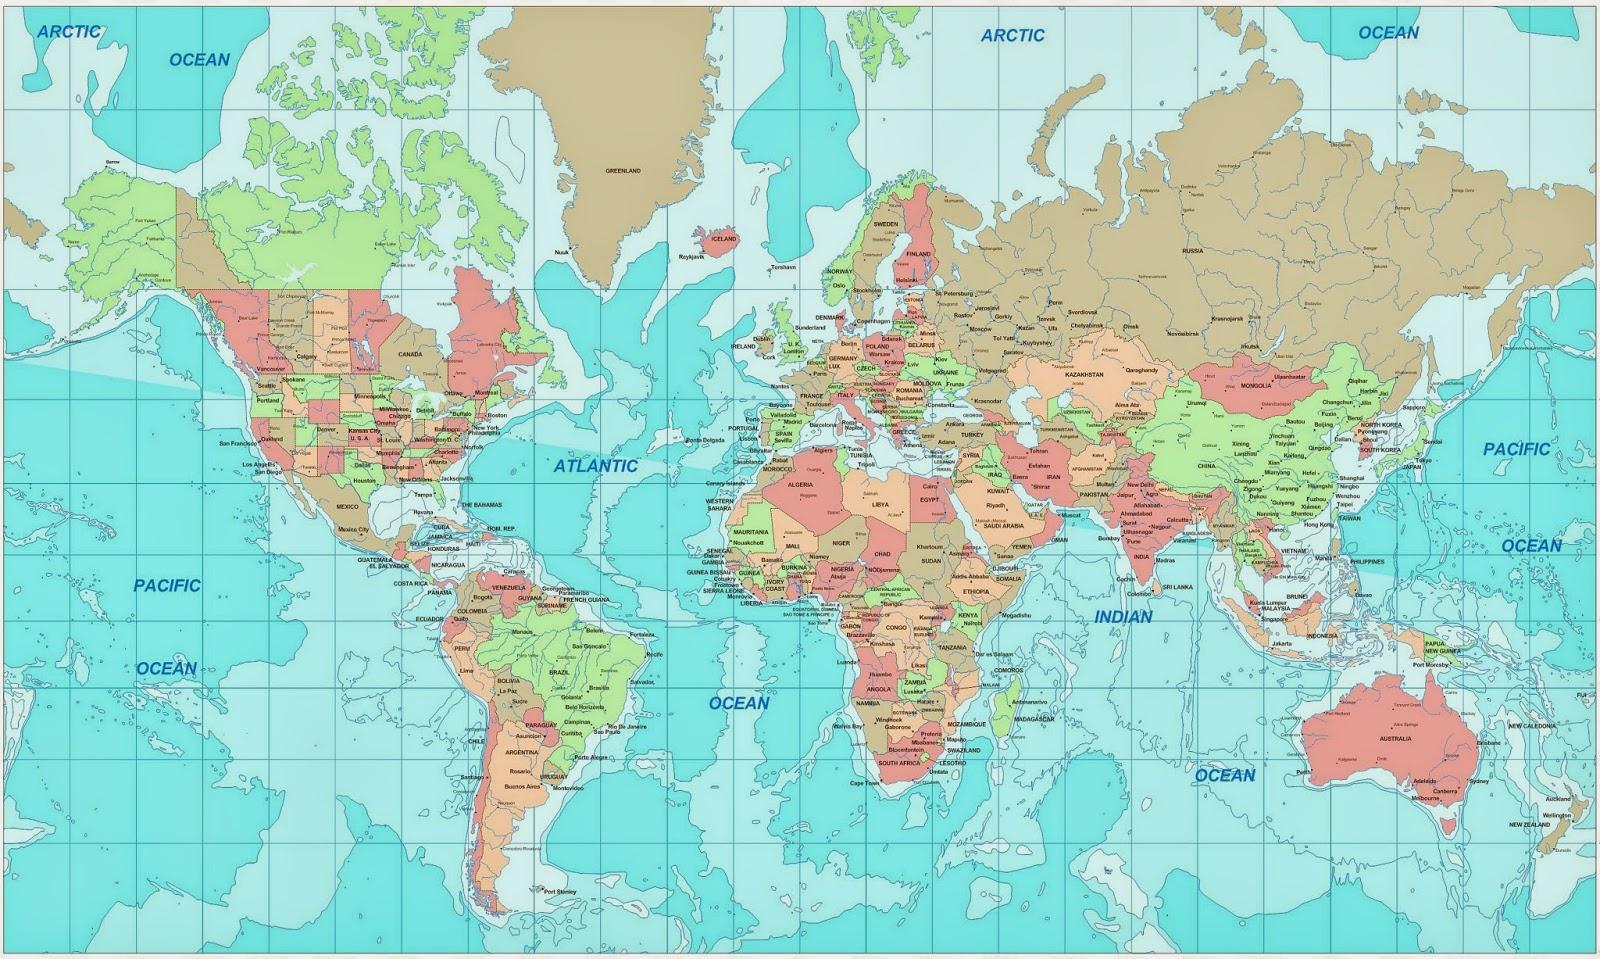 World map desktop wallpaper hd wallpapersafari world map wallpaper desktop wallpapers hd wallpapers 1600x959 gumiabroncs Gallery